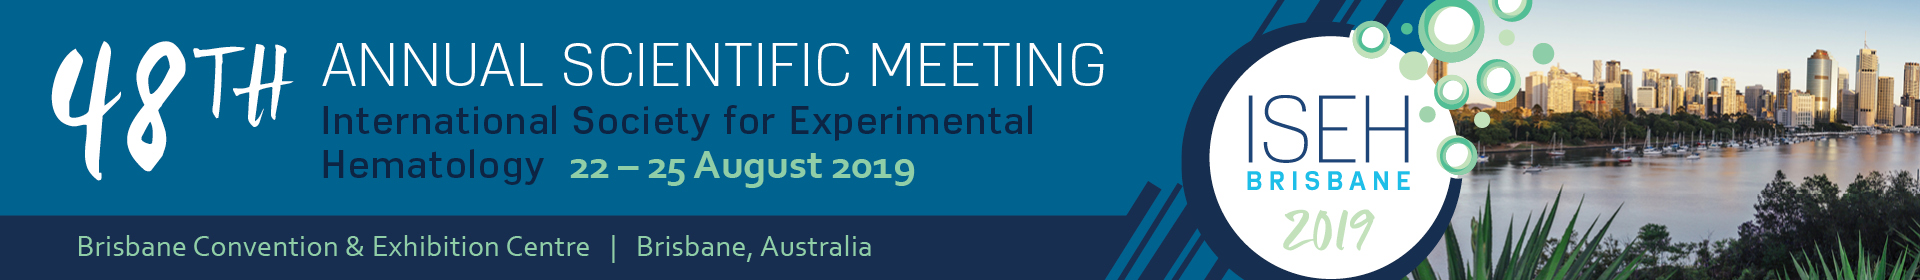 2019 Program - International Society for Experimental Hematology